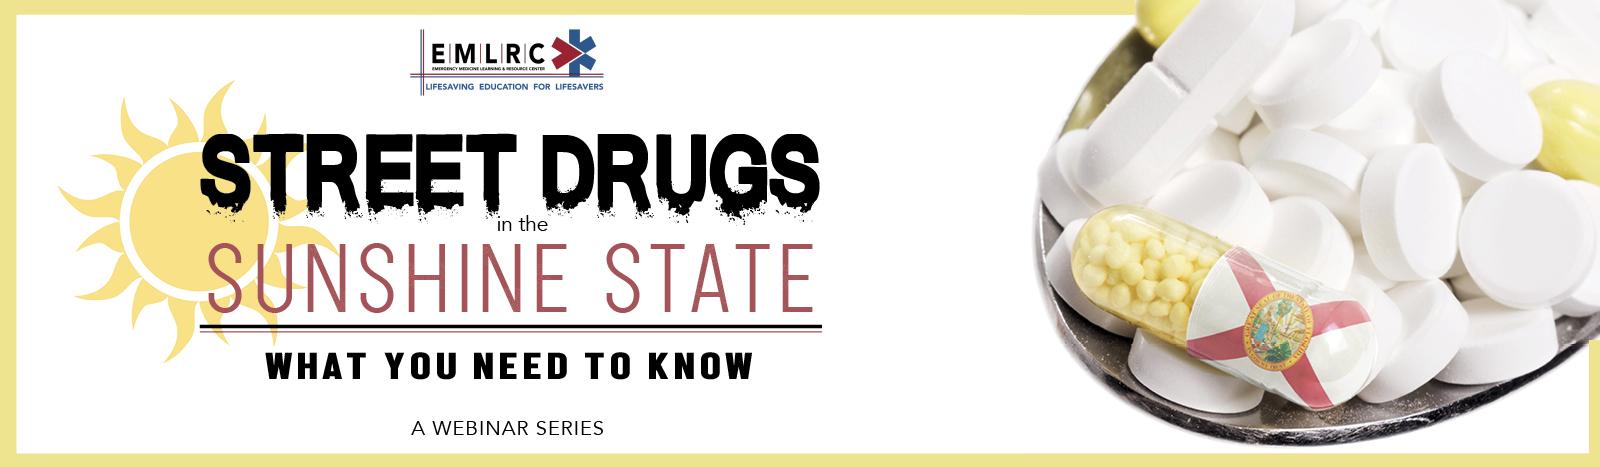 Street Drugs Sunshine State_Cvent